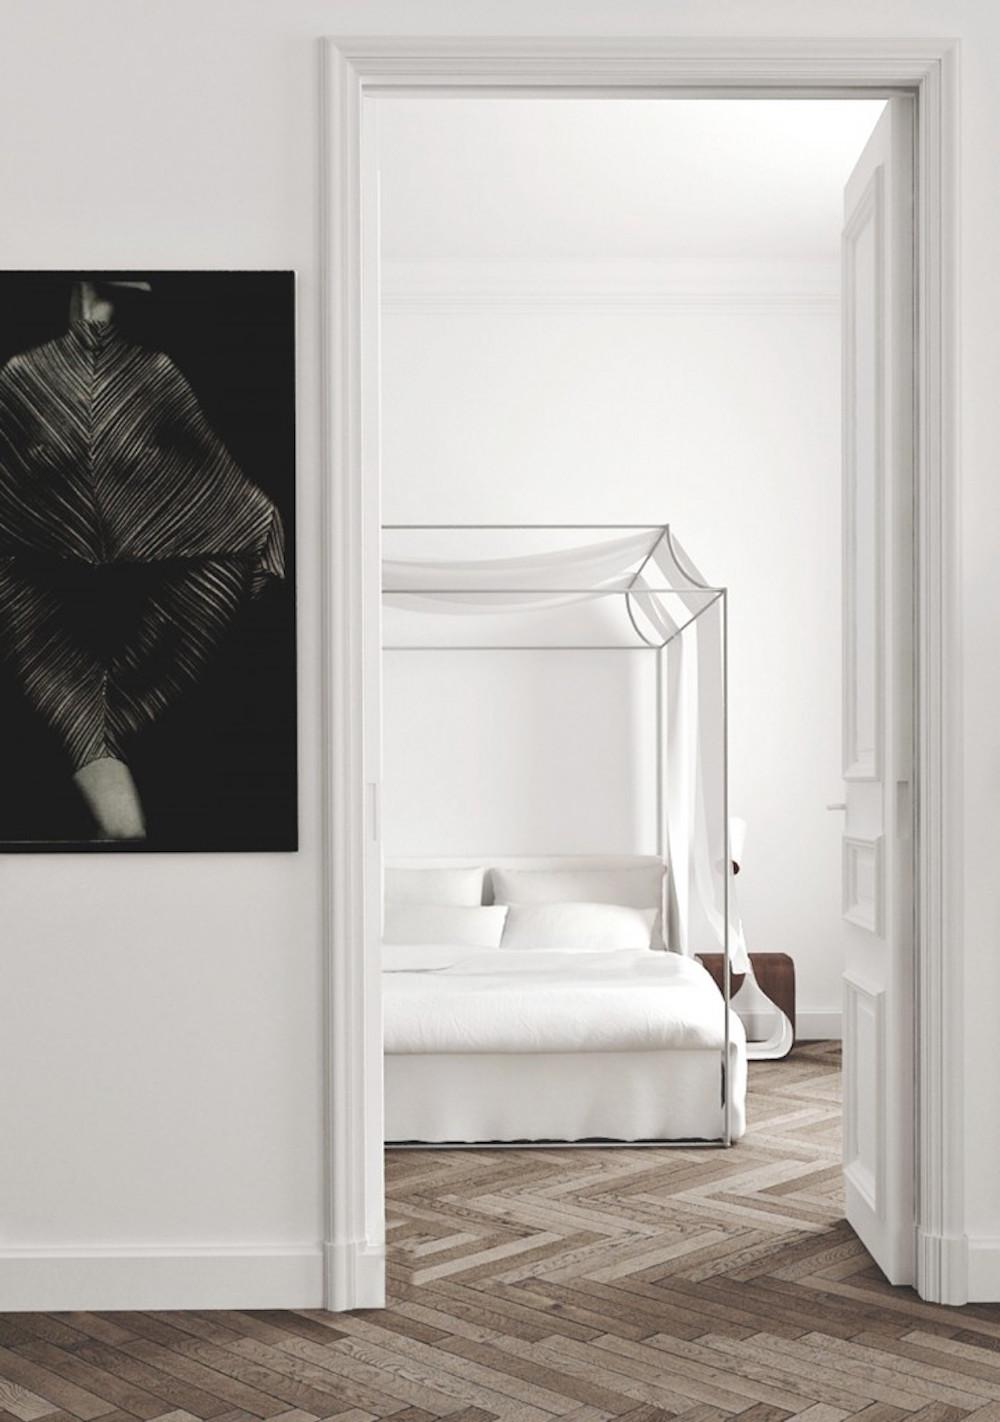 copy-Katty-schiebeck-interior-Paseo-de-Gracia-apartment-oracle-fox-2 copy